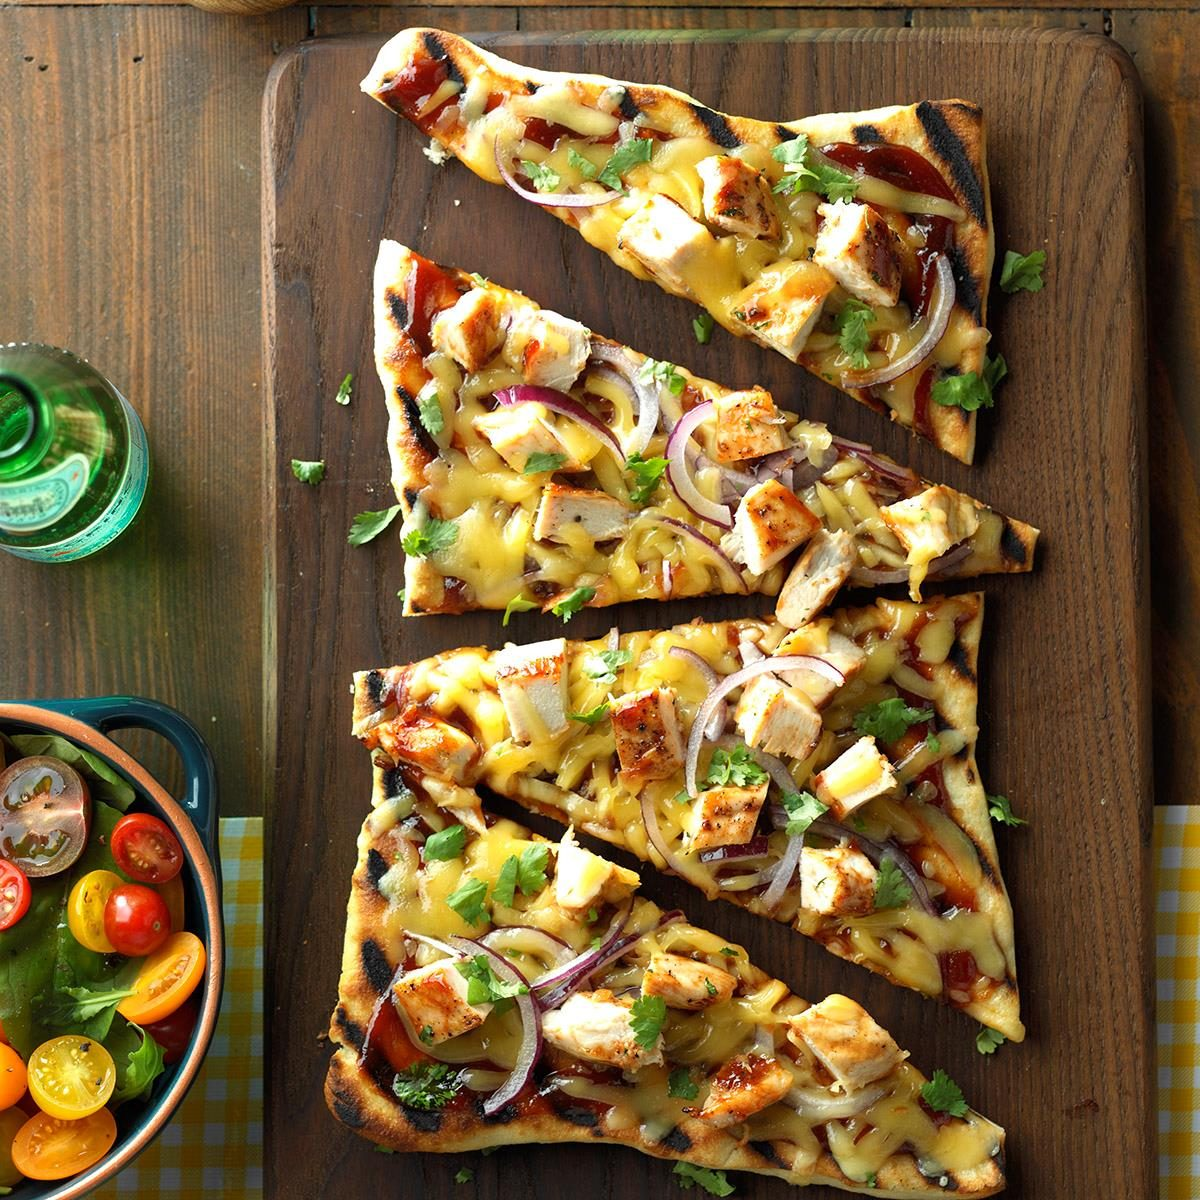 California Pizza Kitchen Menu: 29 California Pizza Kitchen Copycat Recipes To Make At